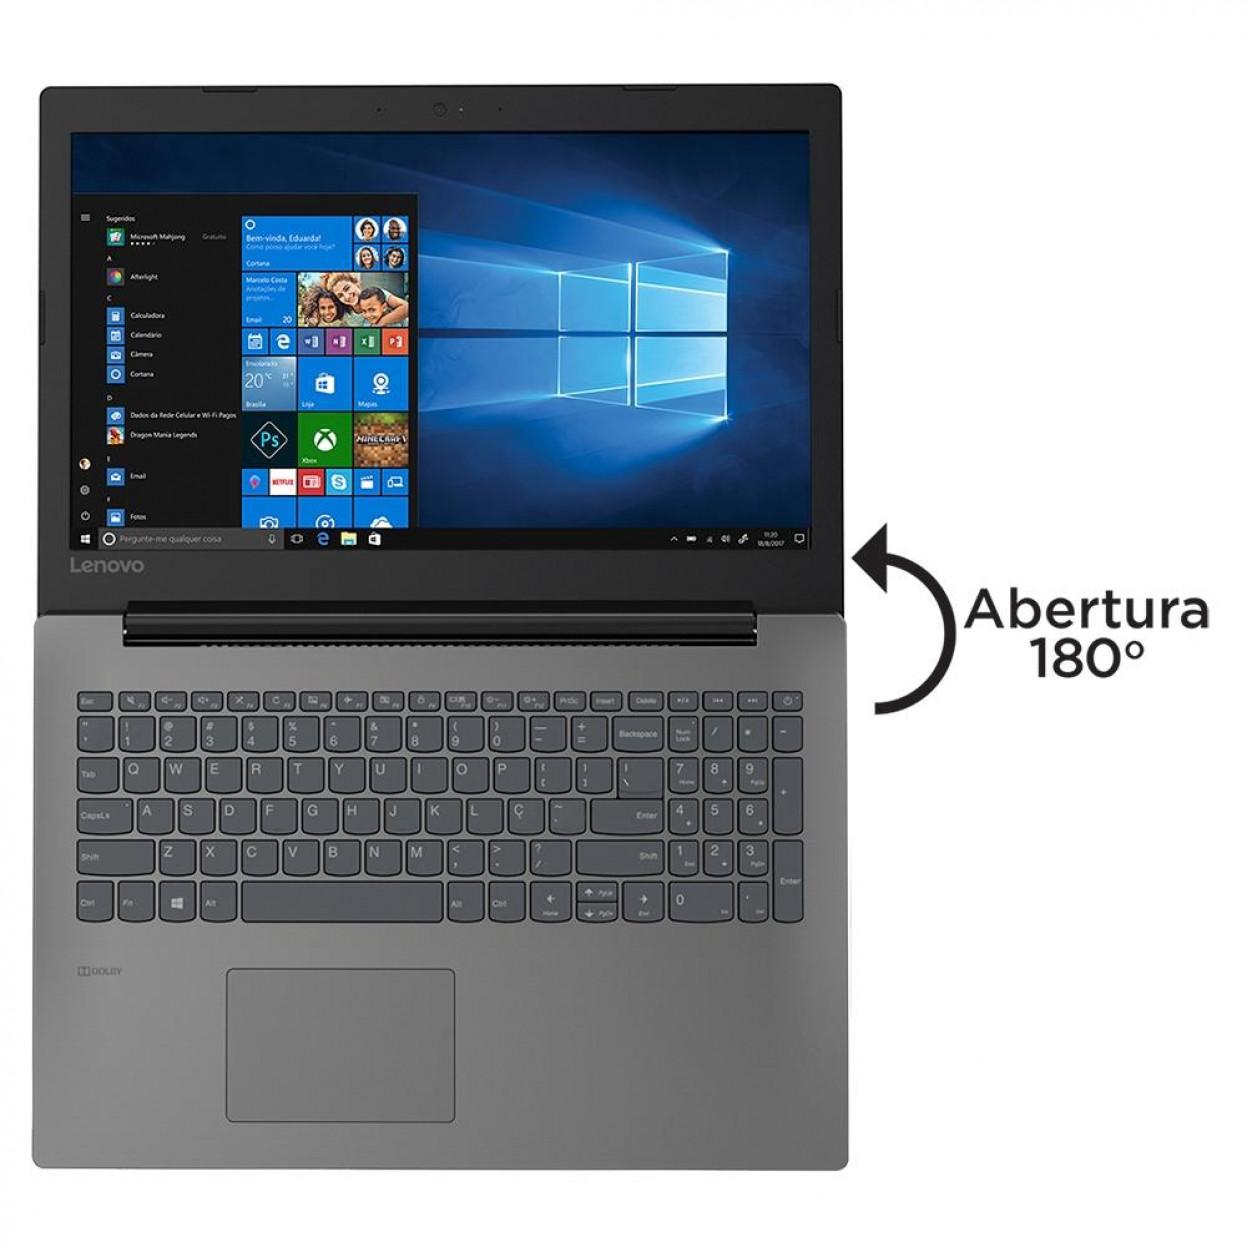 Notebook Lenovo B330 Core I5 8250u Memoria 8gb Ddr4 Ssd 480gb Tela 15.6' Fhd Windows 10 Home